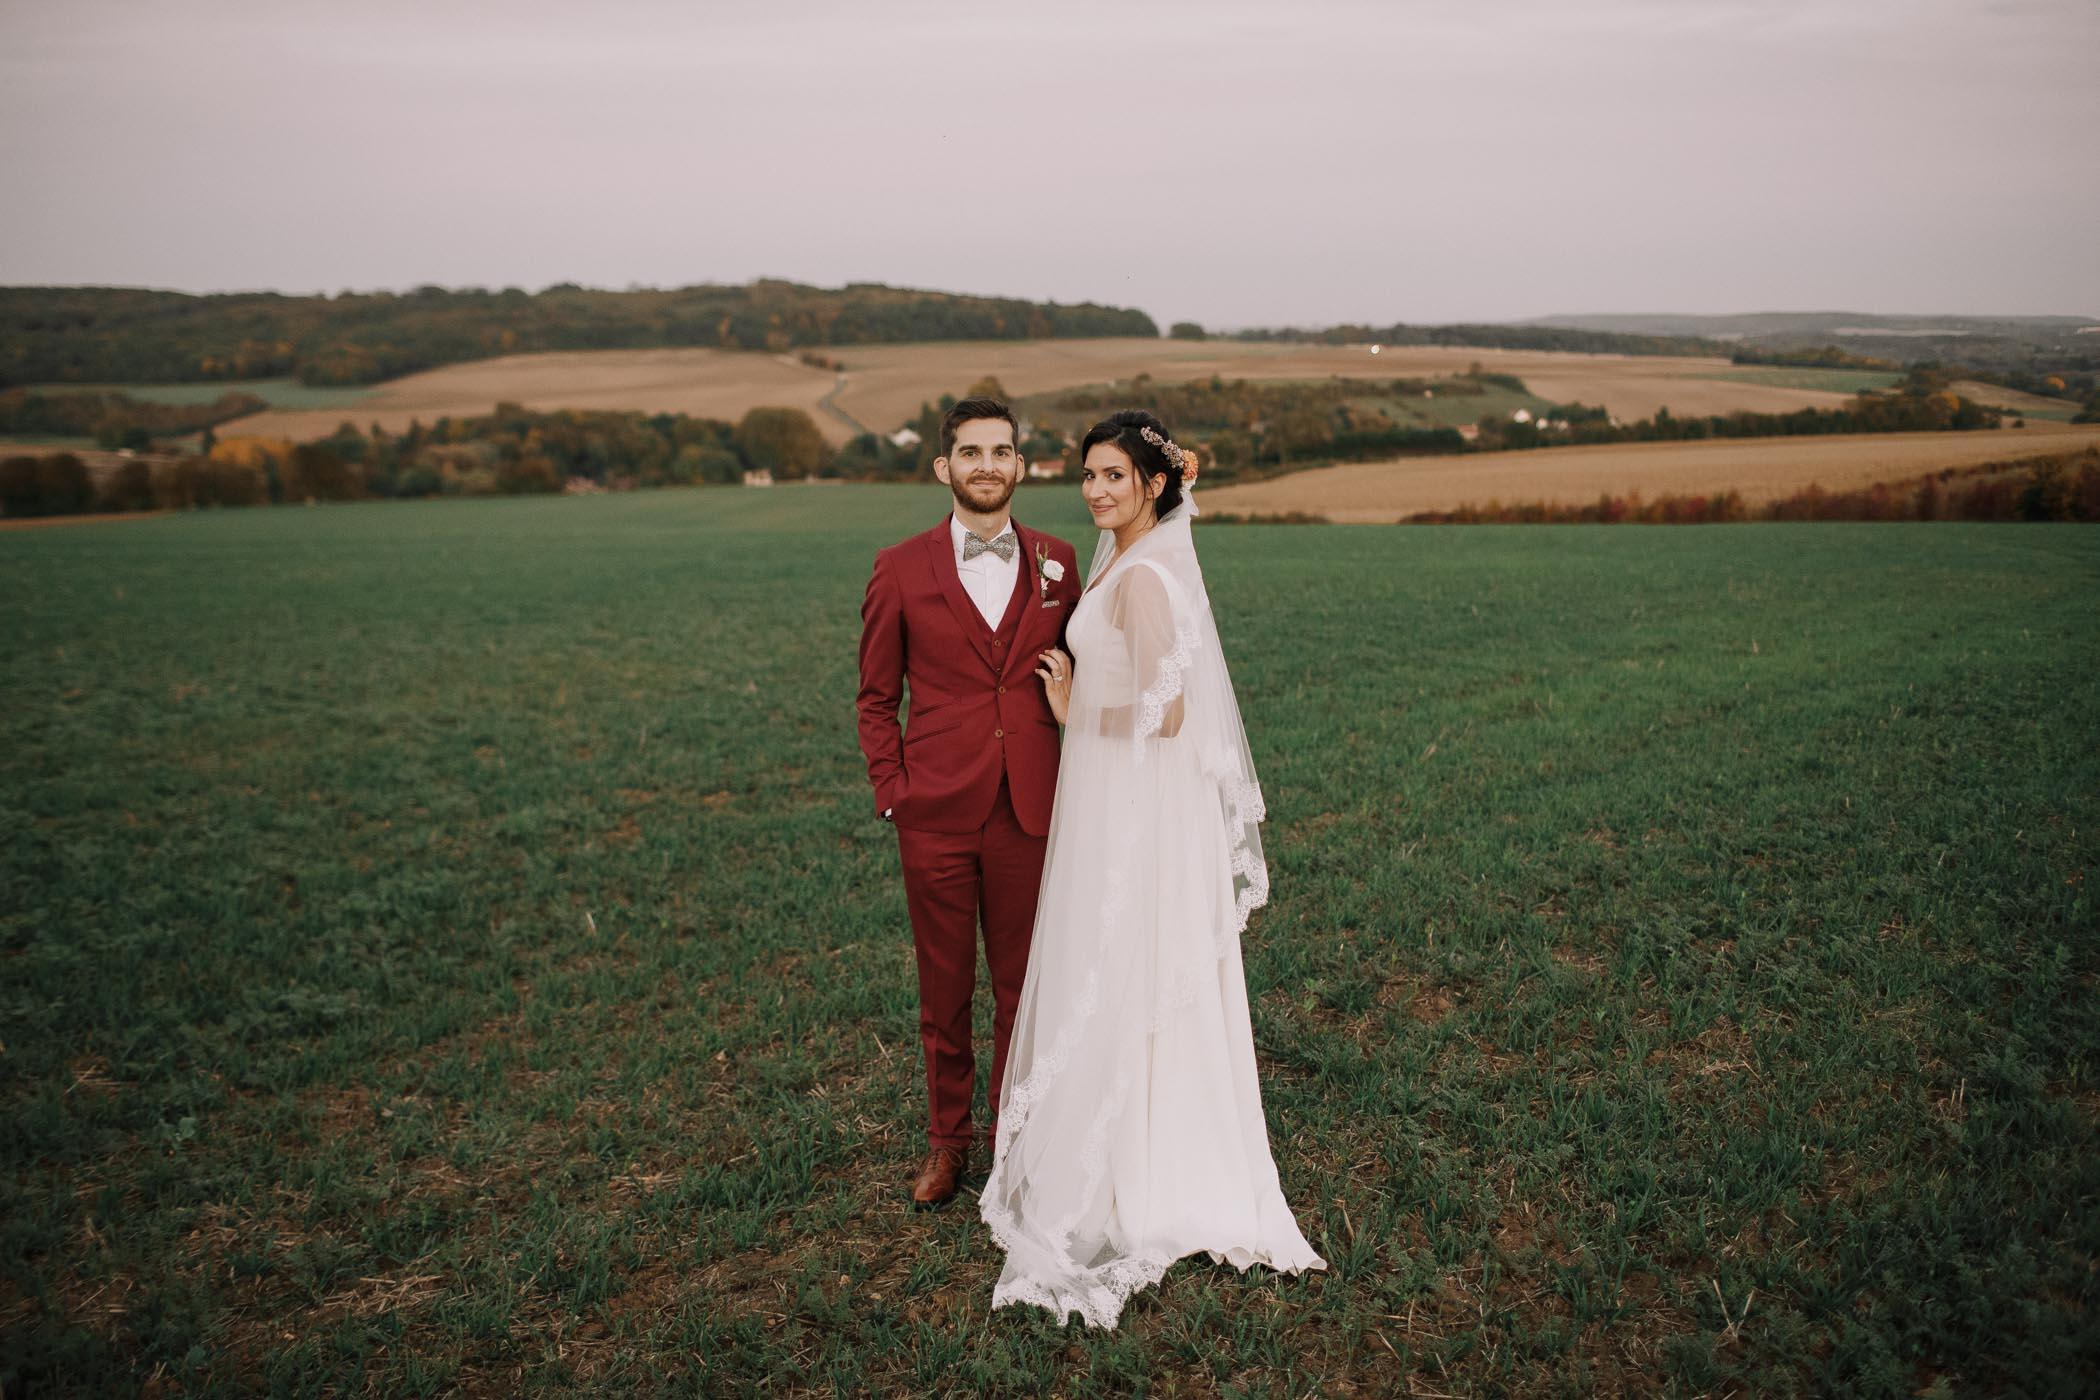 Photographe-mariage-bordeaux-jeremy-boyer-32.jpg